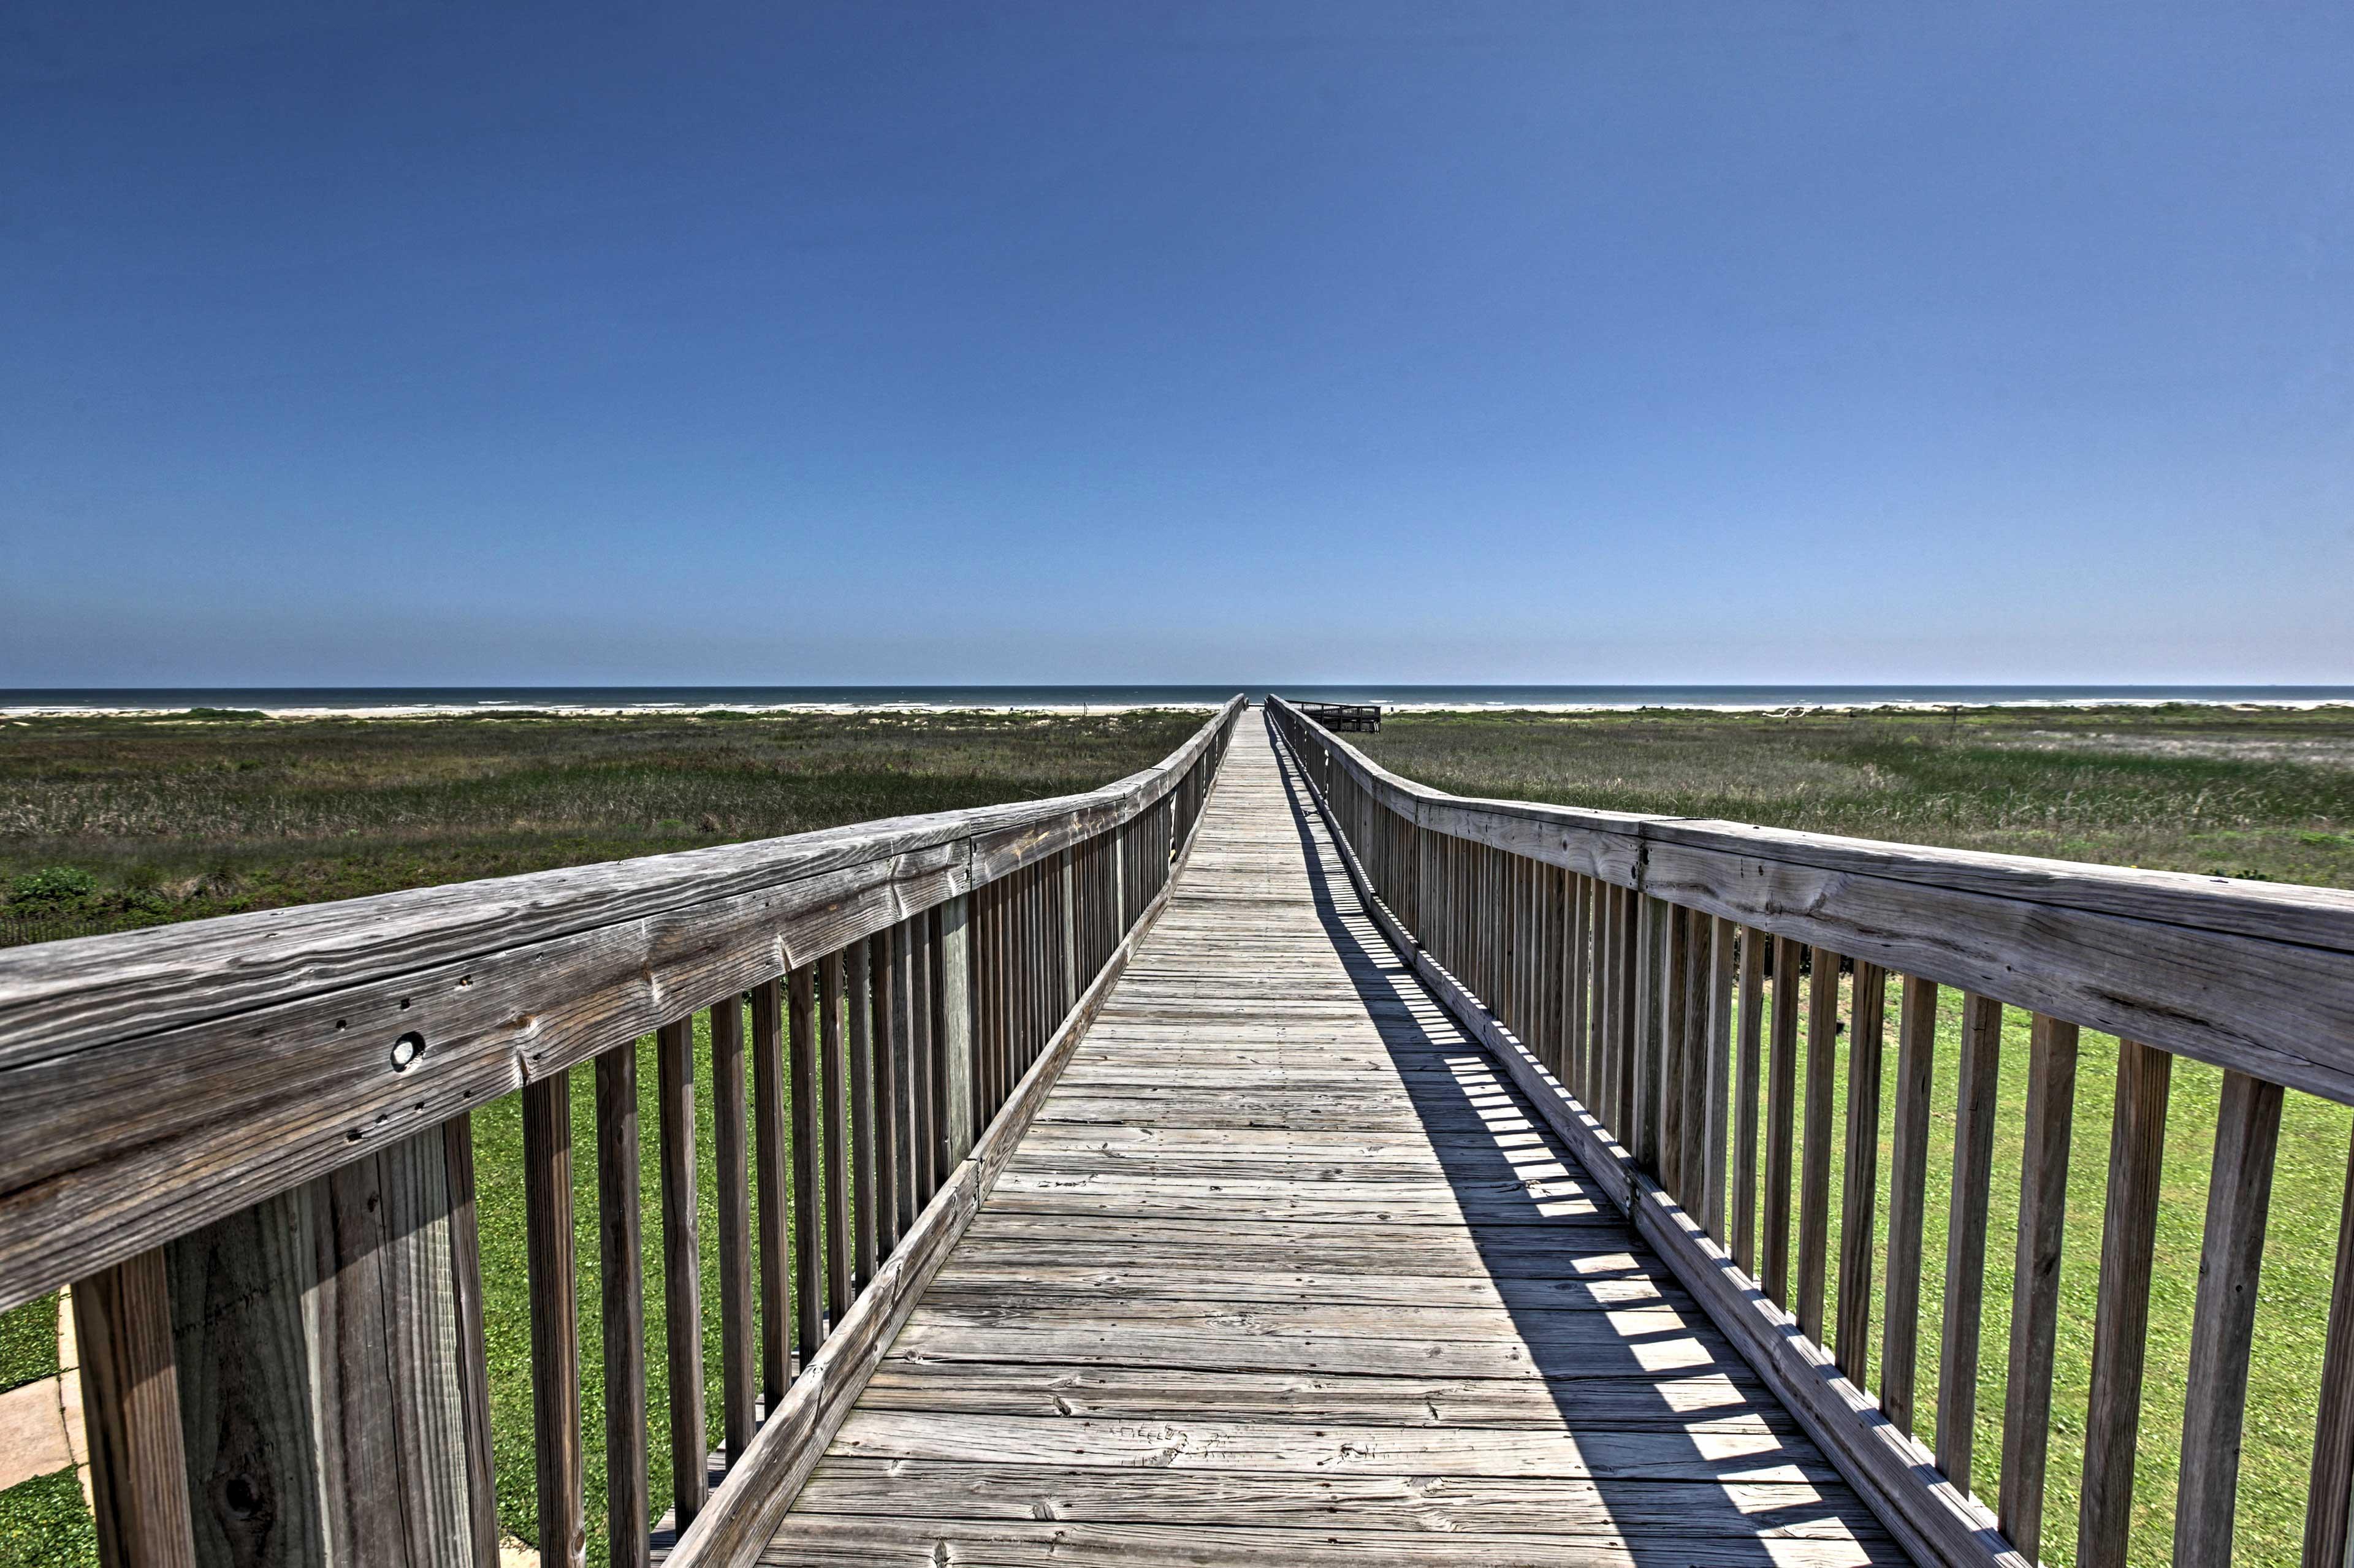 Stroll down the boardwalk to access the beach!